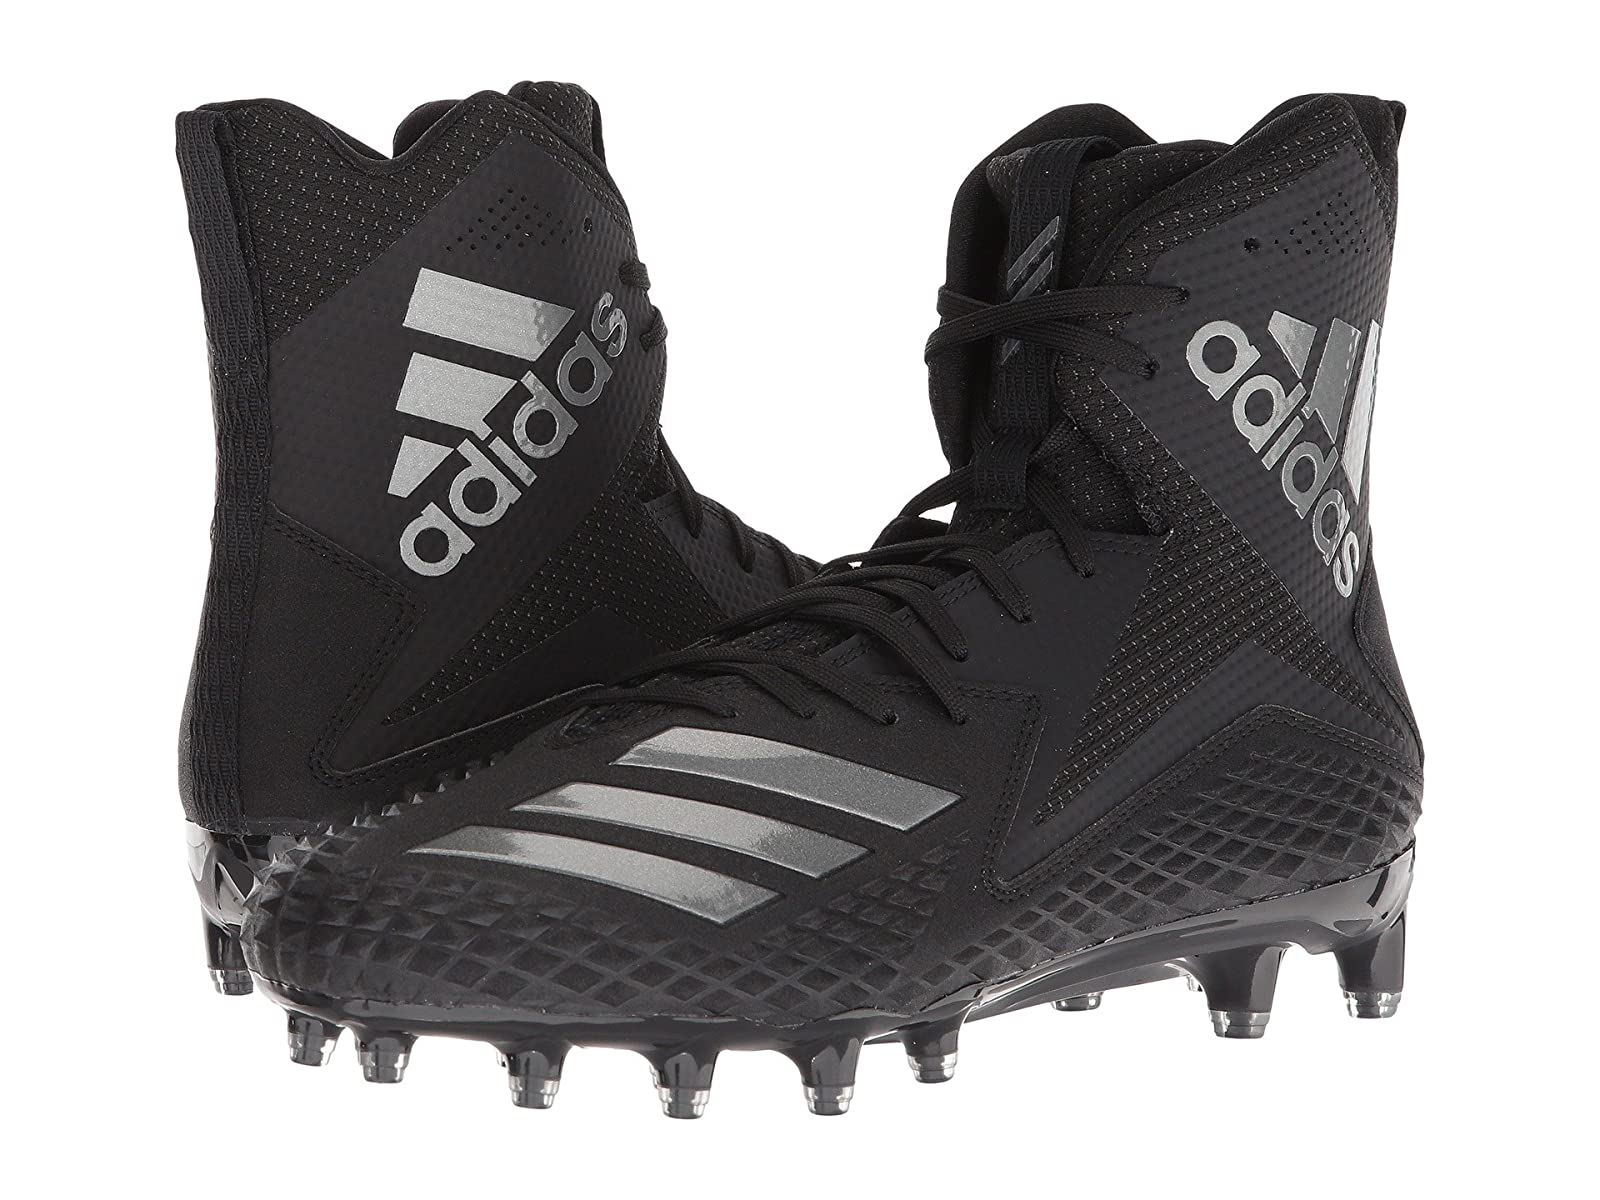 adidas Freak x Carbon HighAtmospheric grades have affordable shoes